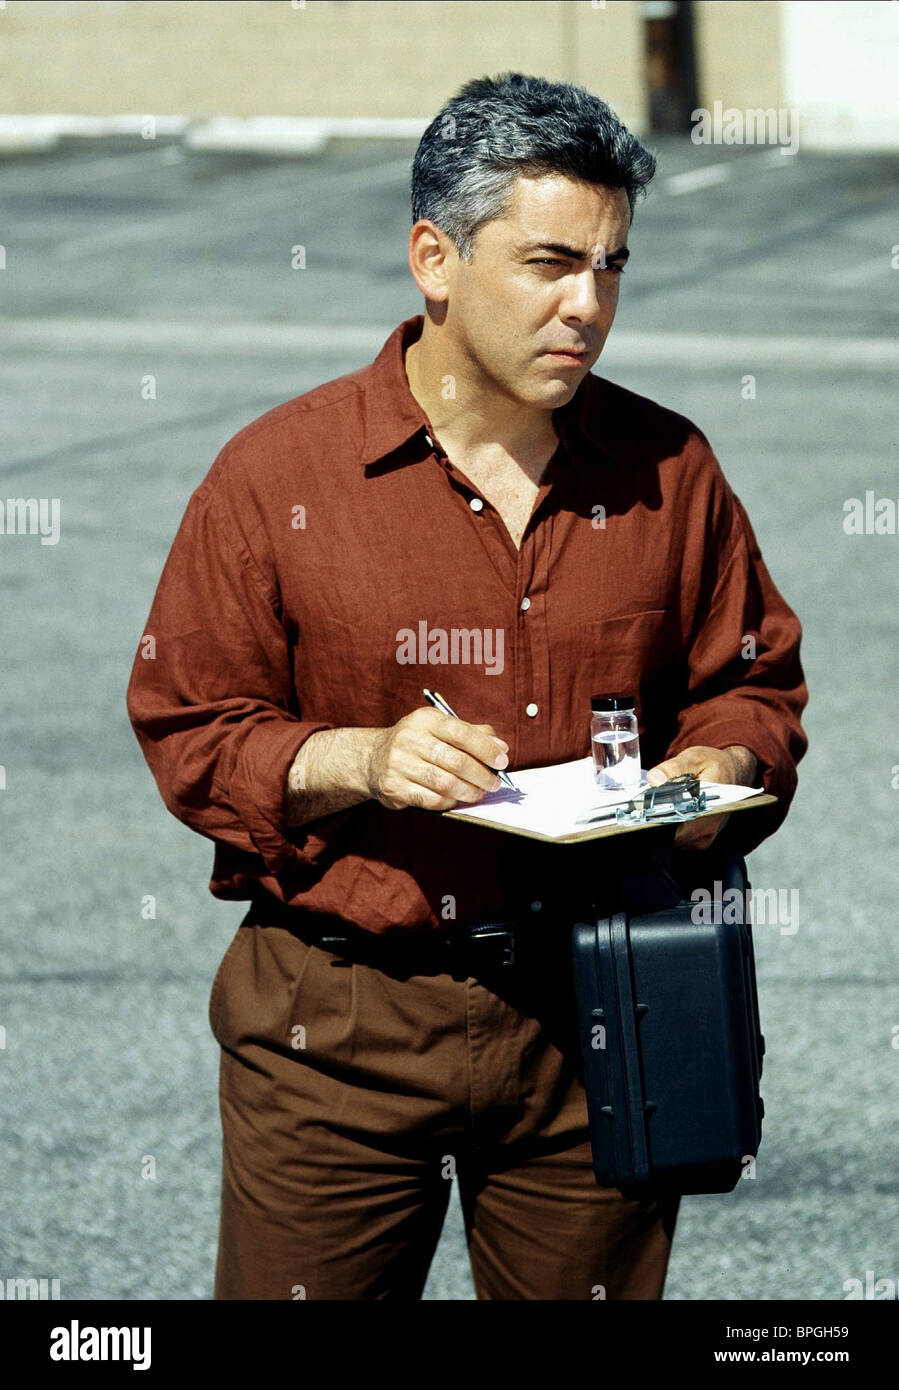 ADAM ARKIN THIRST; (1998) - Stock Image